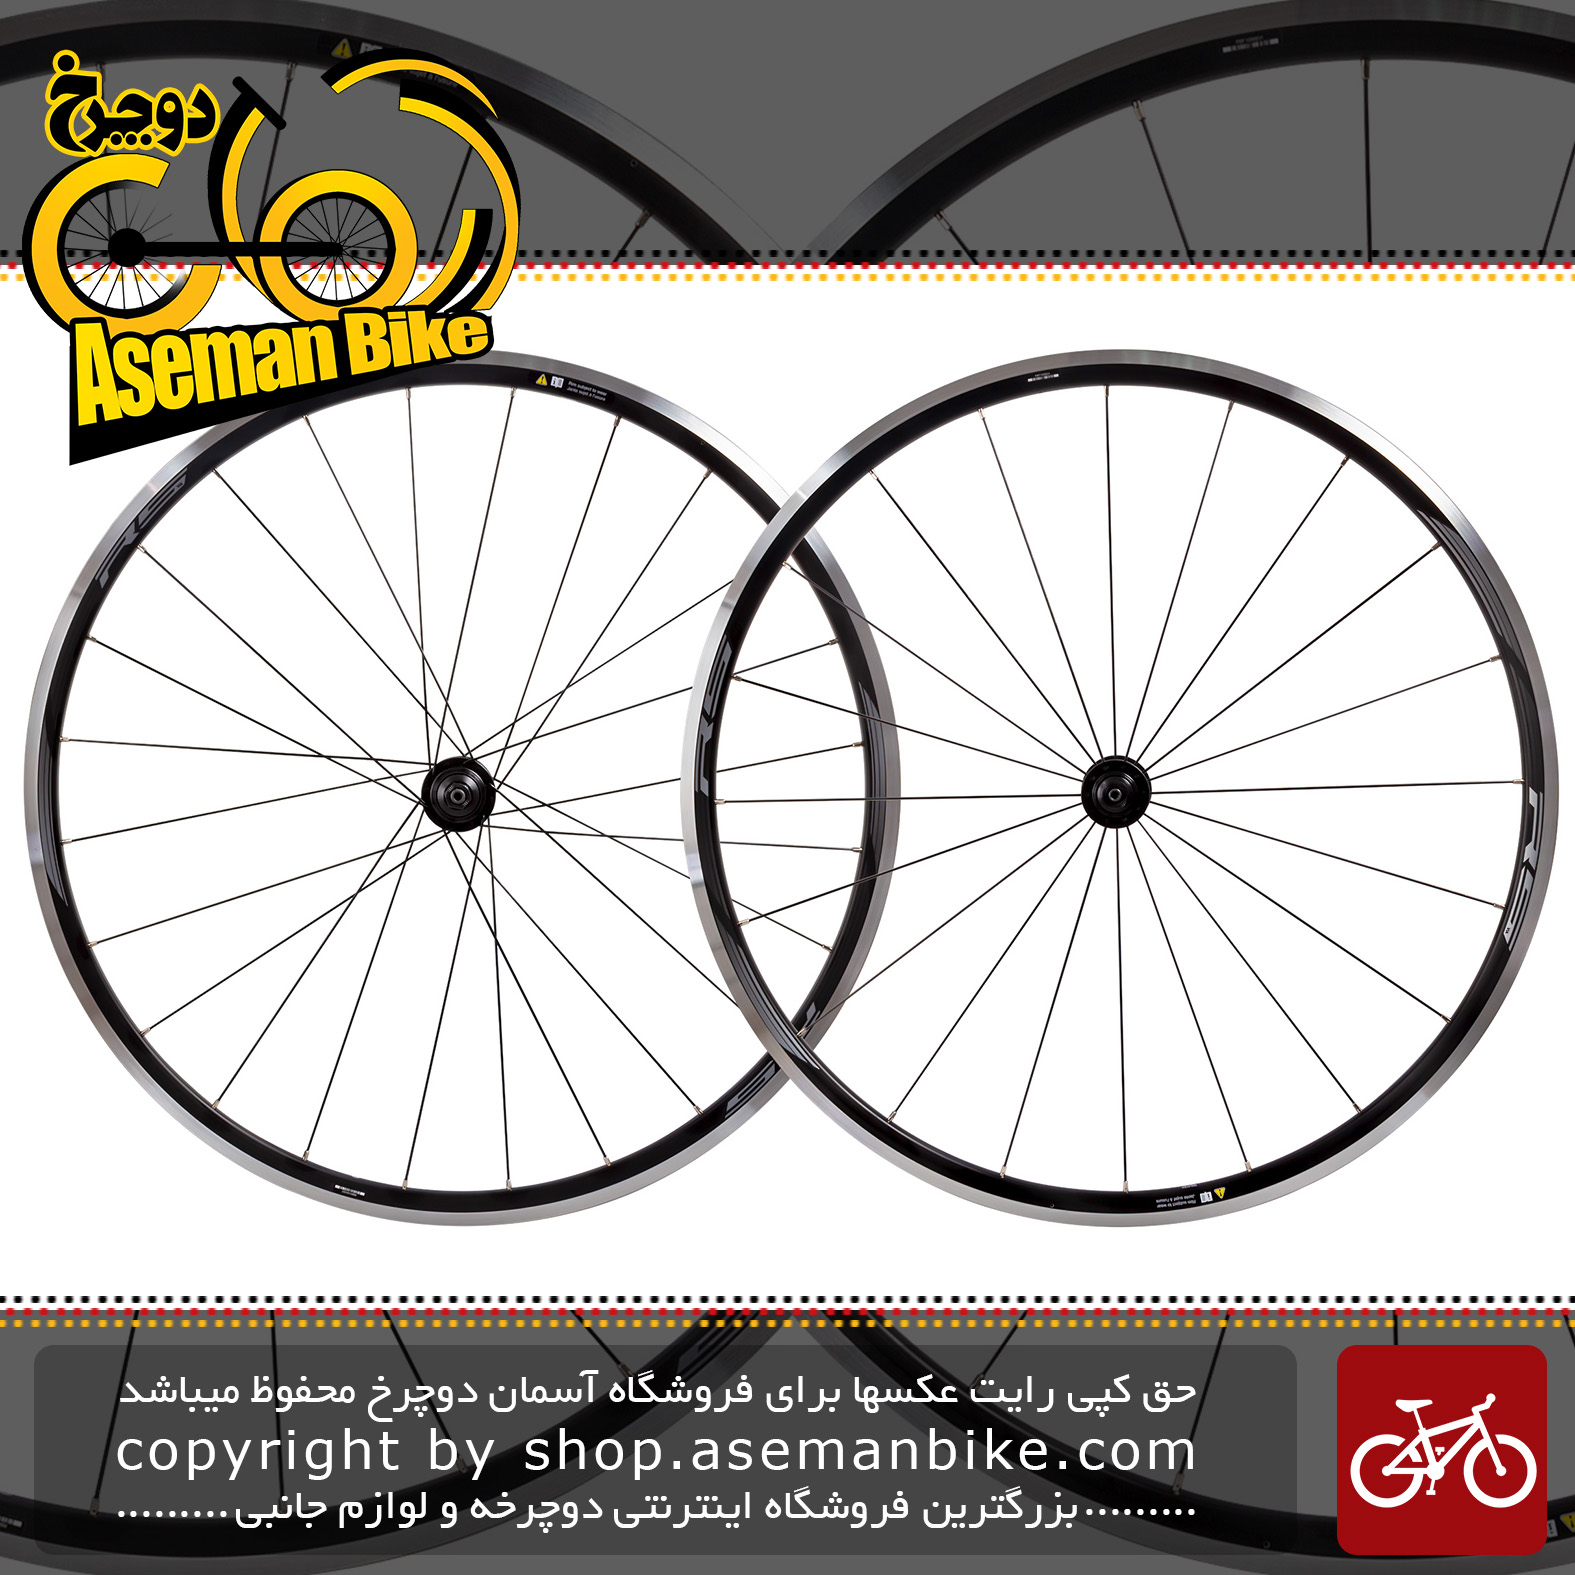 طوقه کامل دوچرخه شیمانو وی اچ 010 SHIMANO Wheelset WH-RS010-CL-Front & Rear Acceleration concept cincher wheel